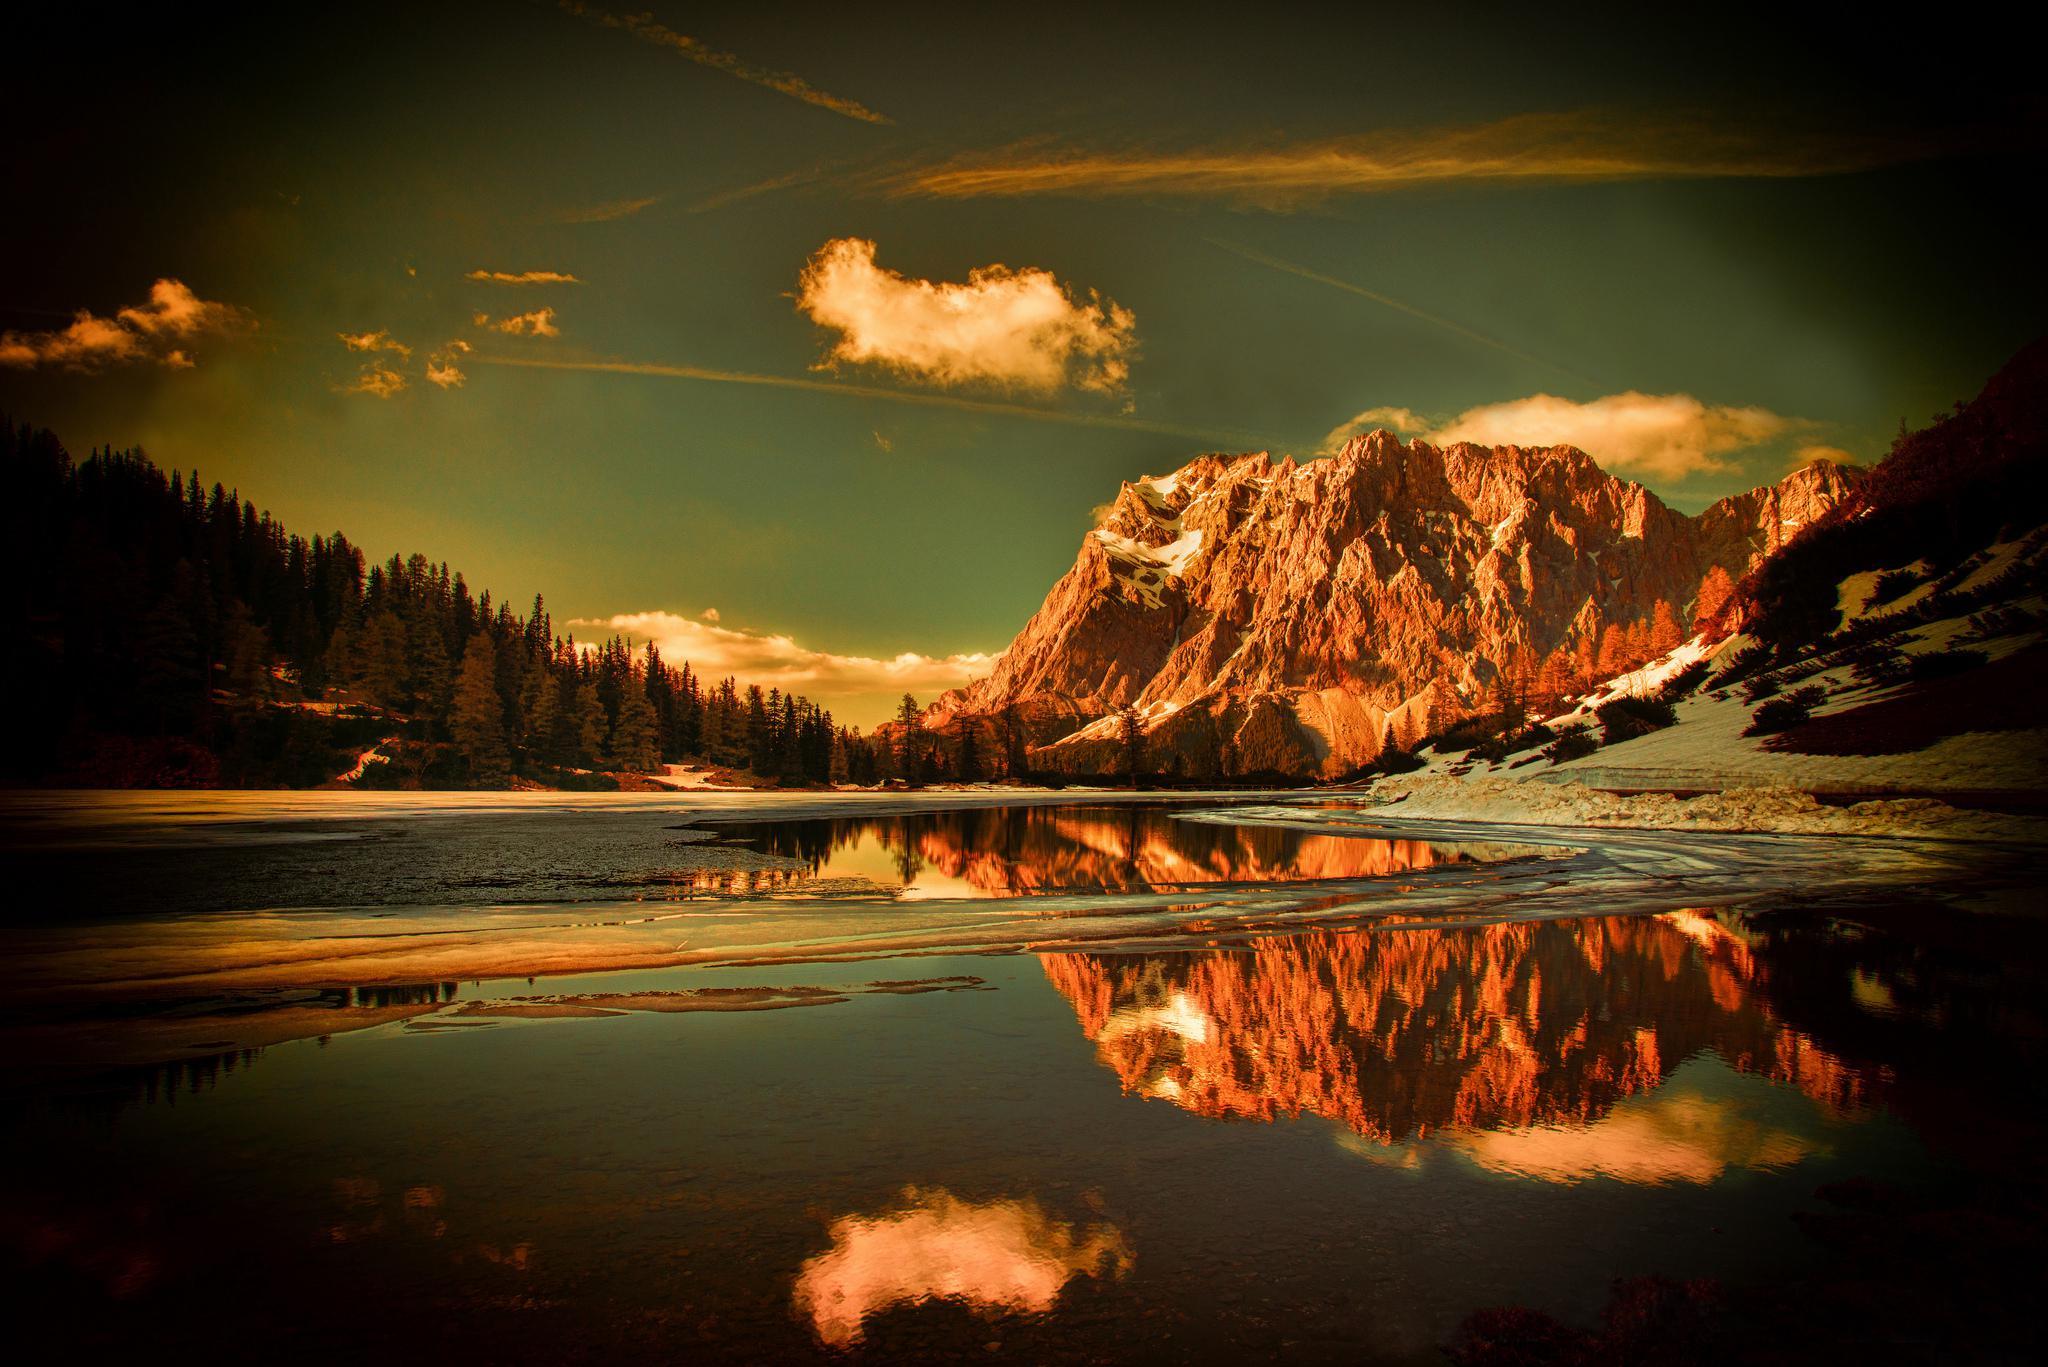 Cute Baby Dress Wallpaper Hd Mountains Forest Snow Water Lake Reflection Desktop